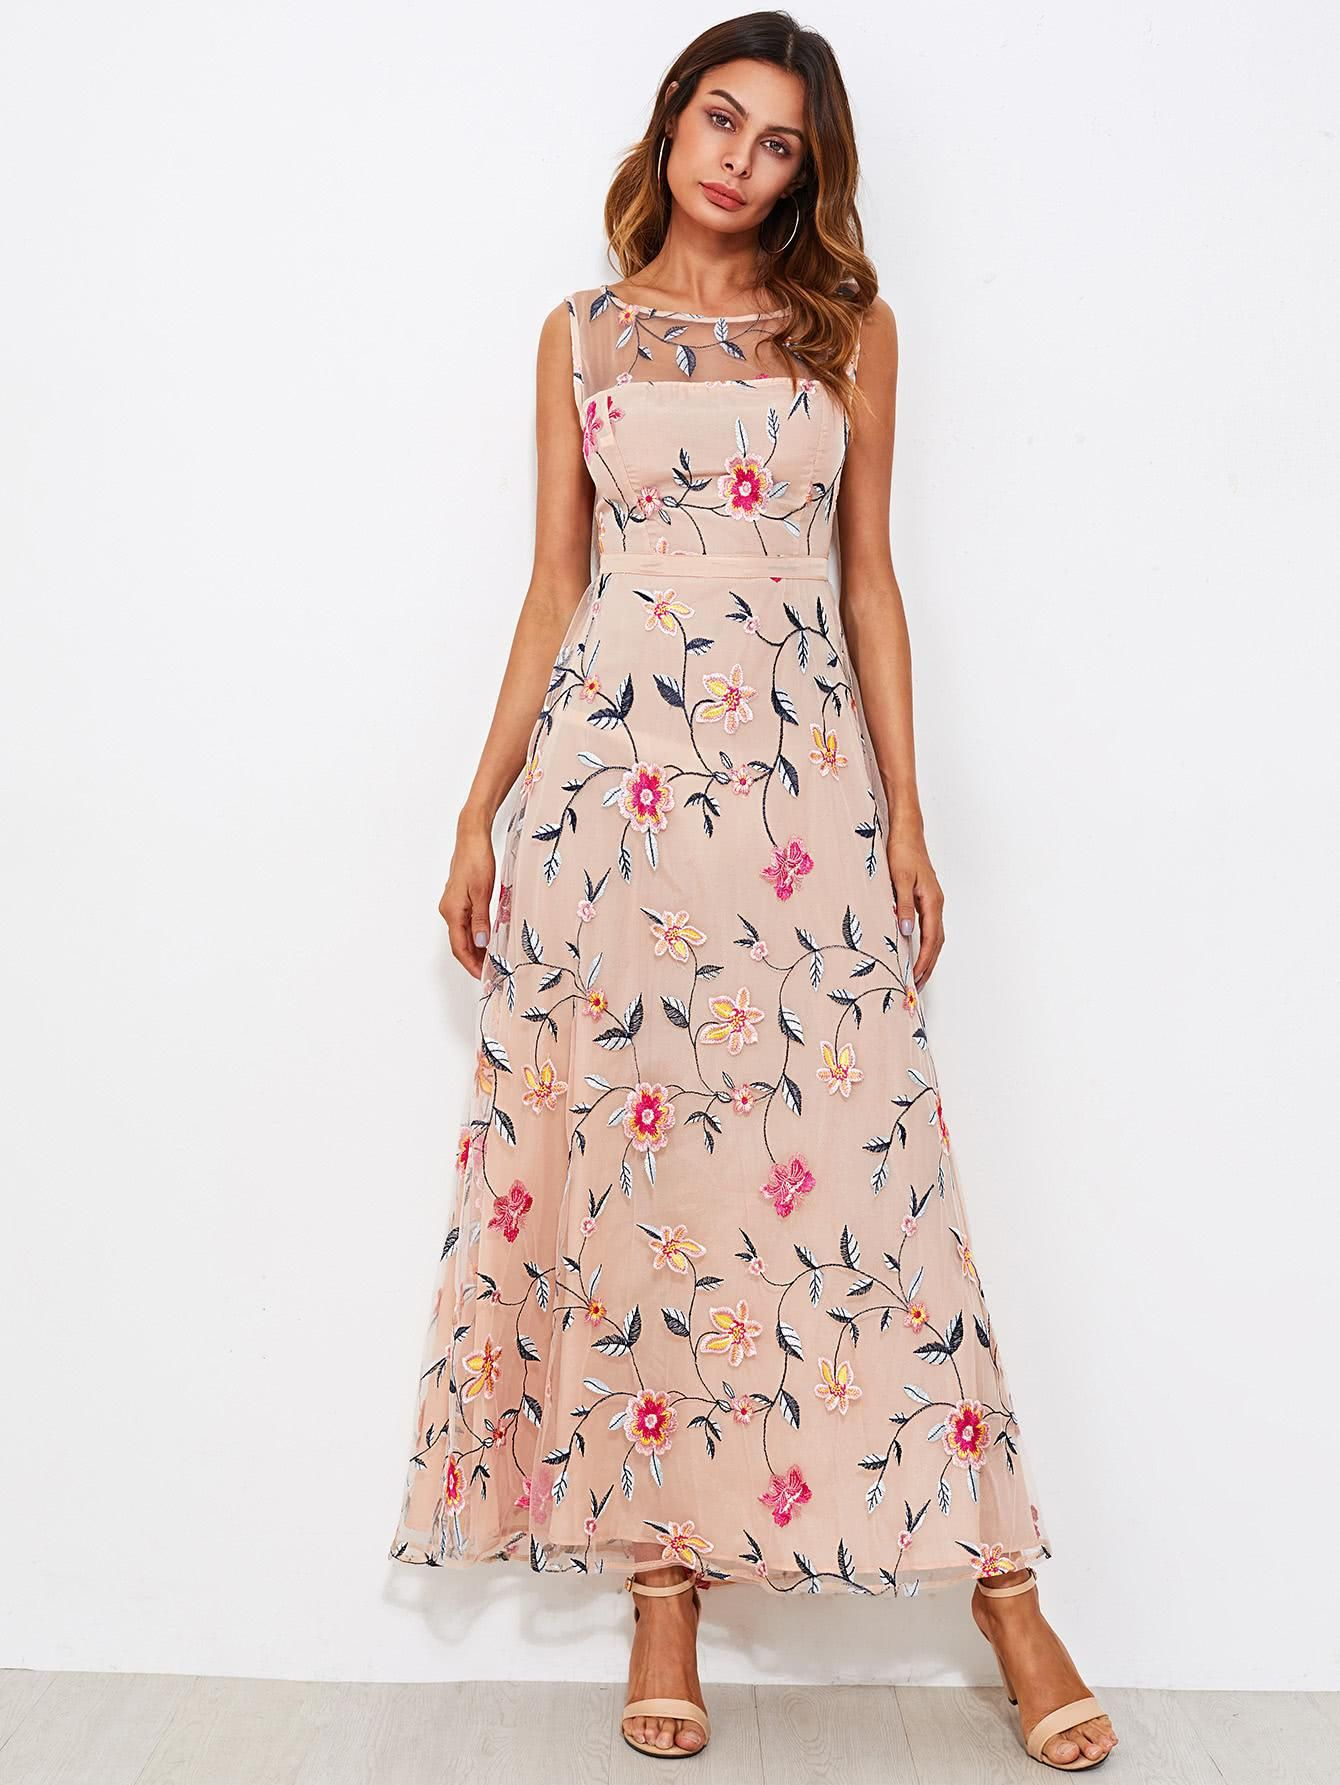 4098f1dbc SheIn - SheIn All Over Flower Embroidered Mesh Overlay Dress - AdoreWe.com